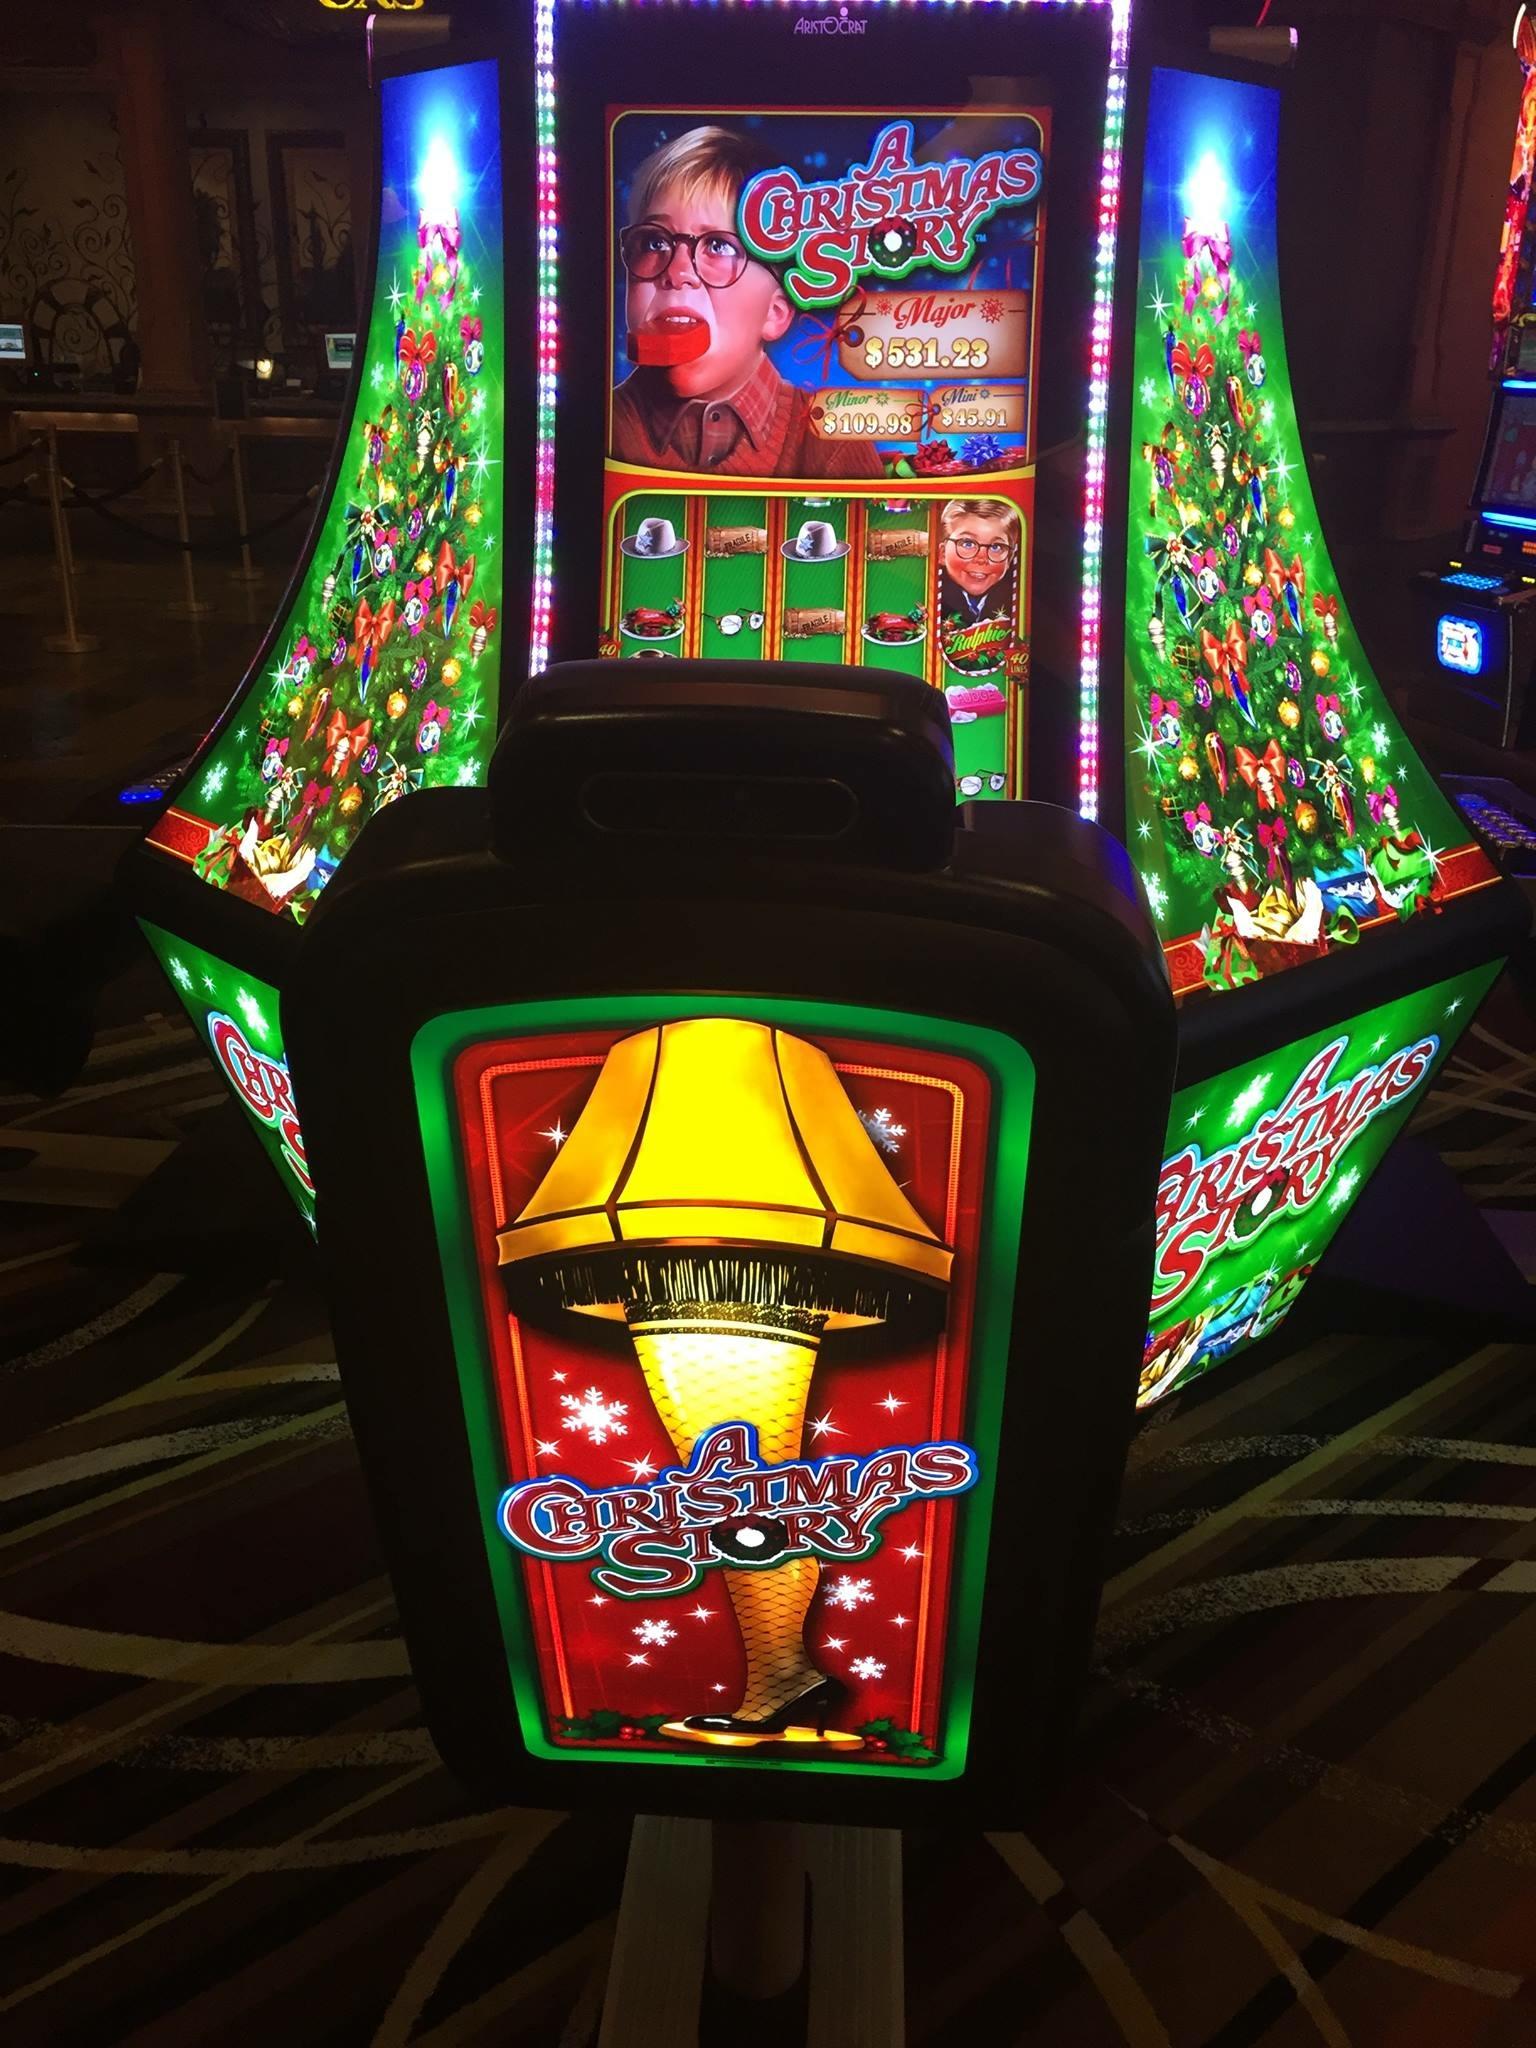 A Christmas Story Slot Machine